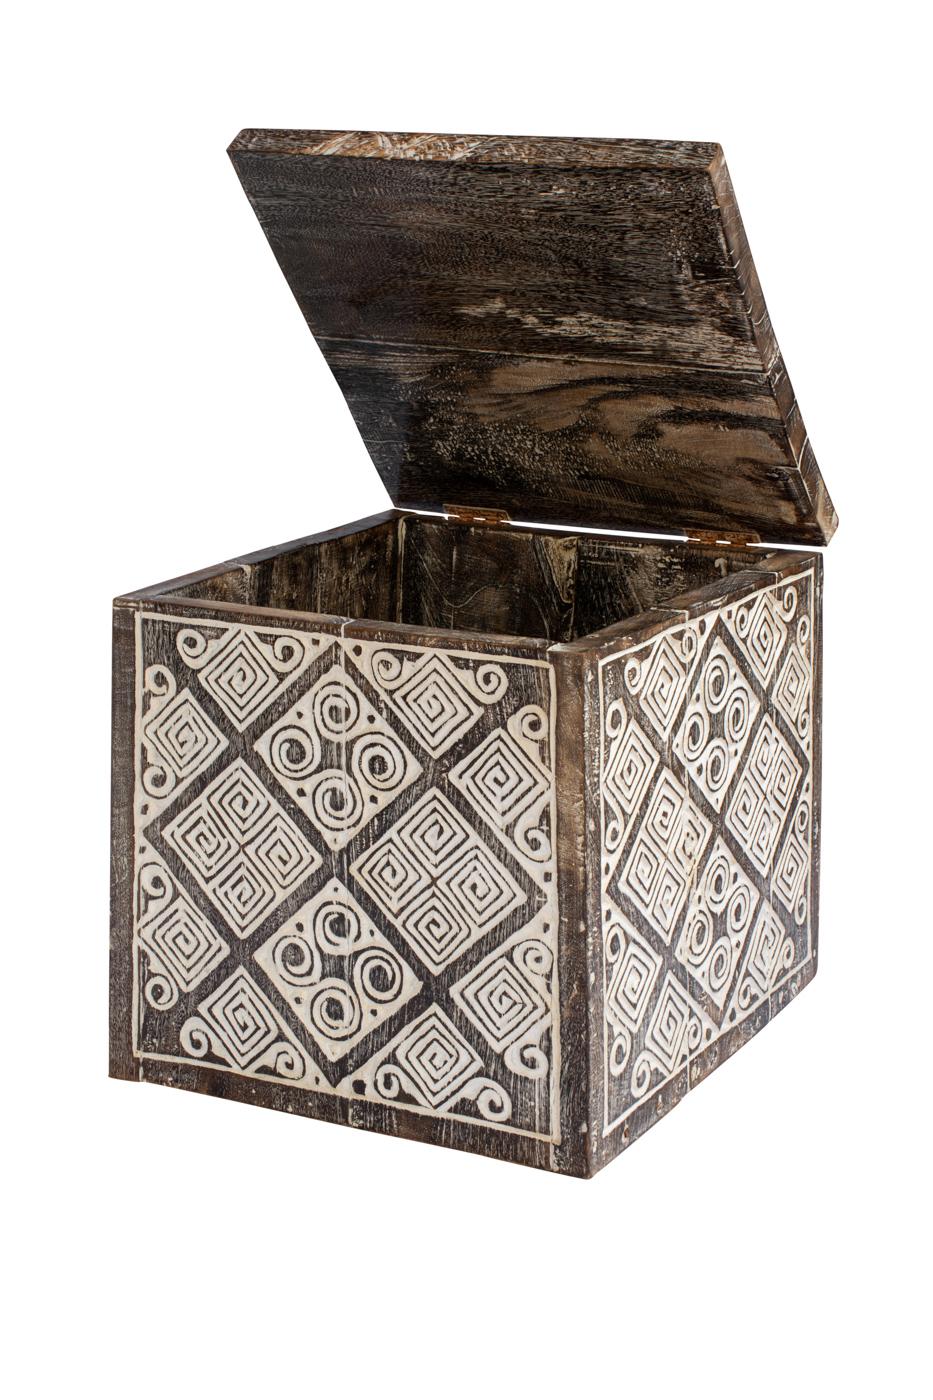 Baúl decorativo Timor en madera